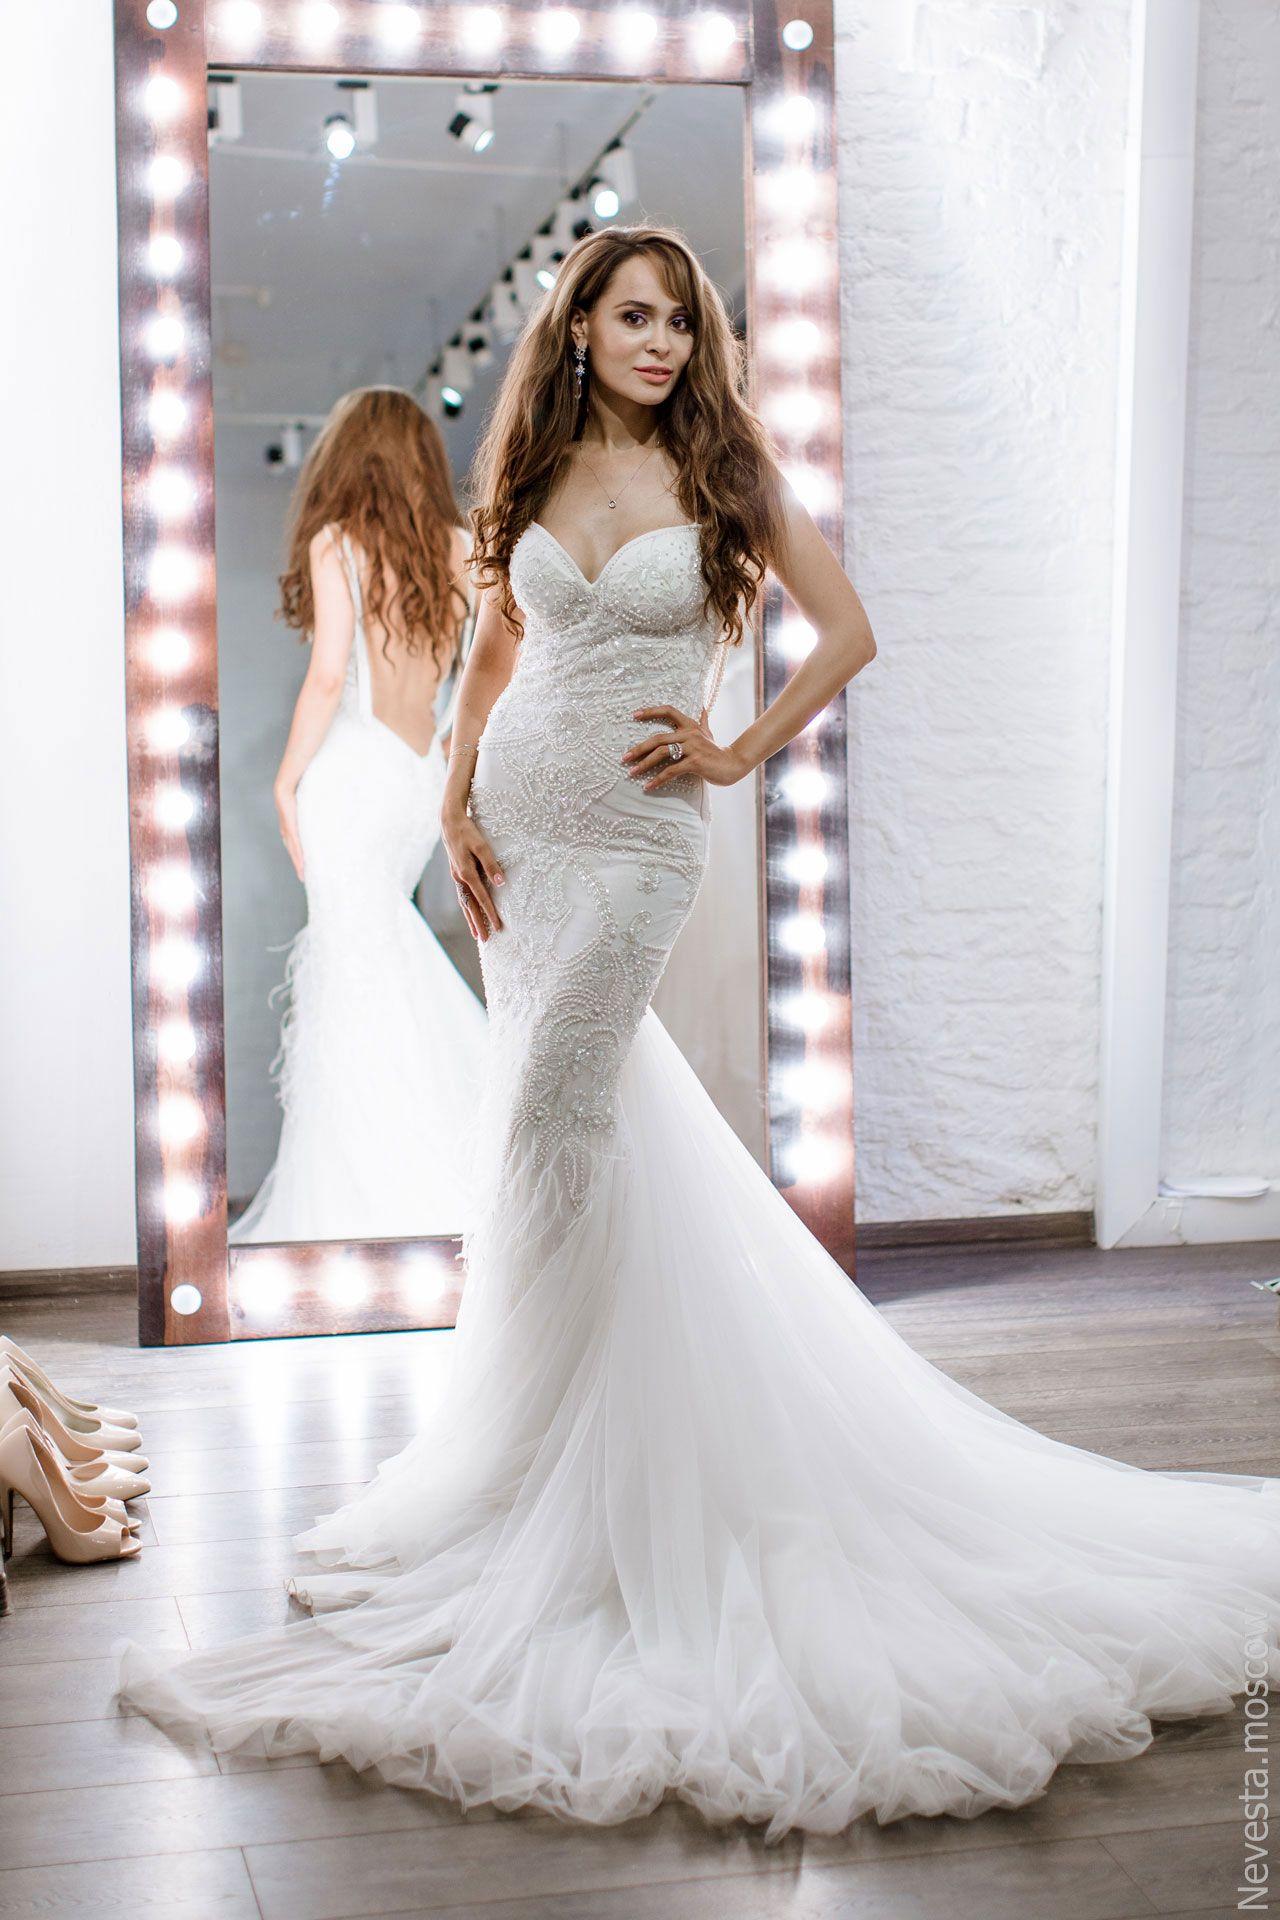 Актриса Анна Калашникова в образе белого лебедя фото 21